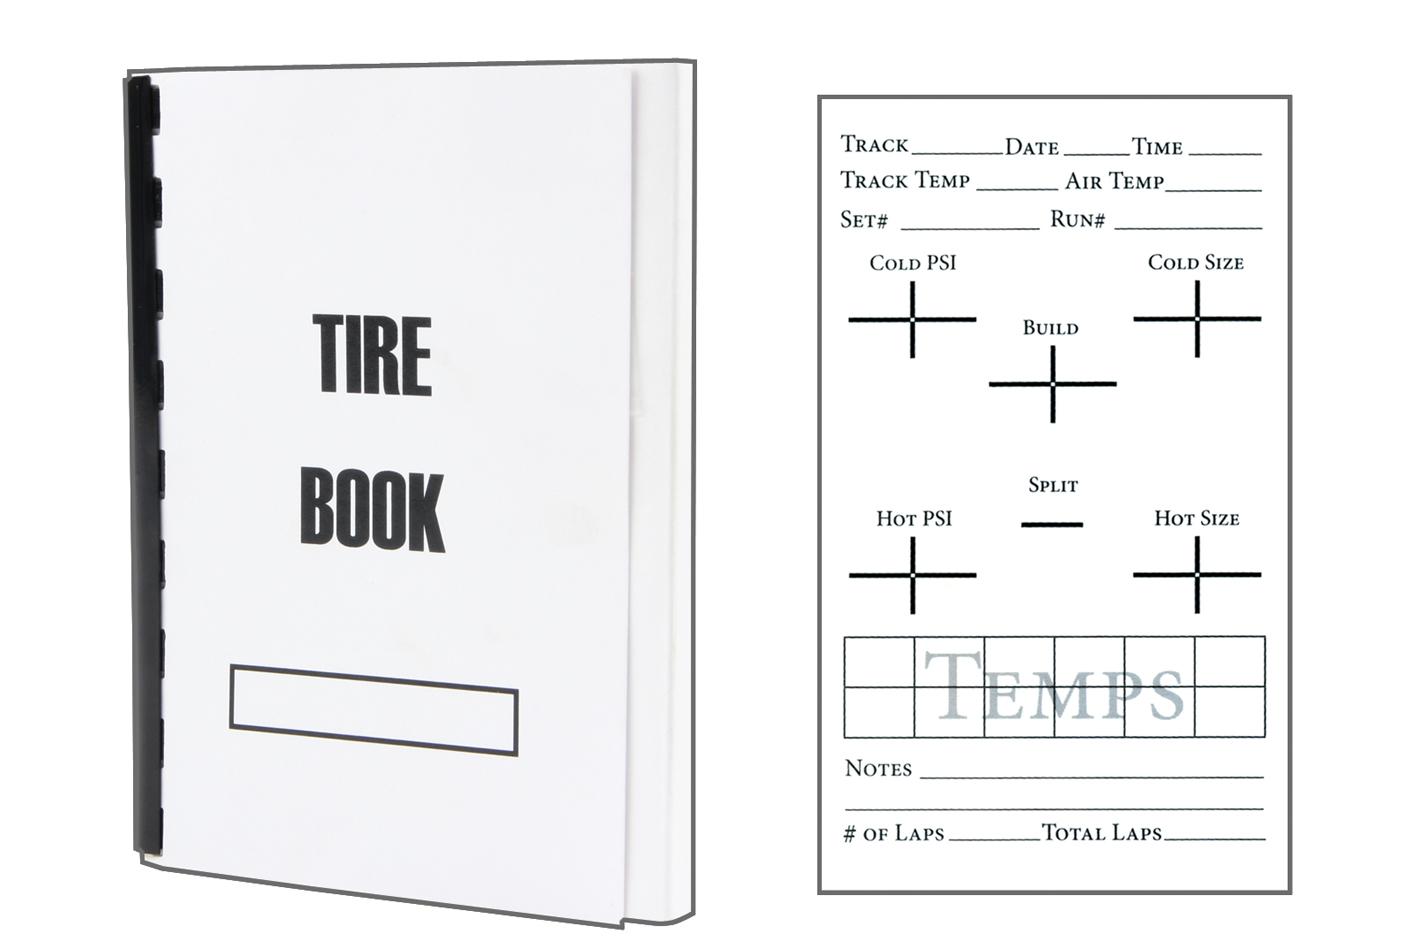 Allstar Performance Asphalt Tire Book